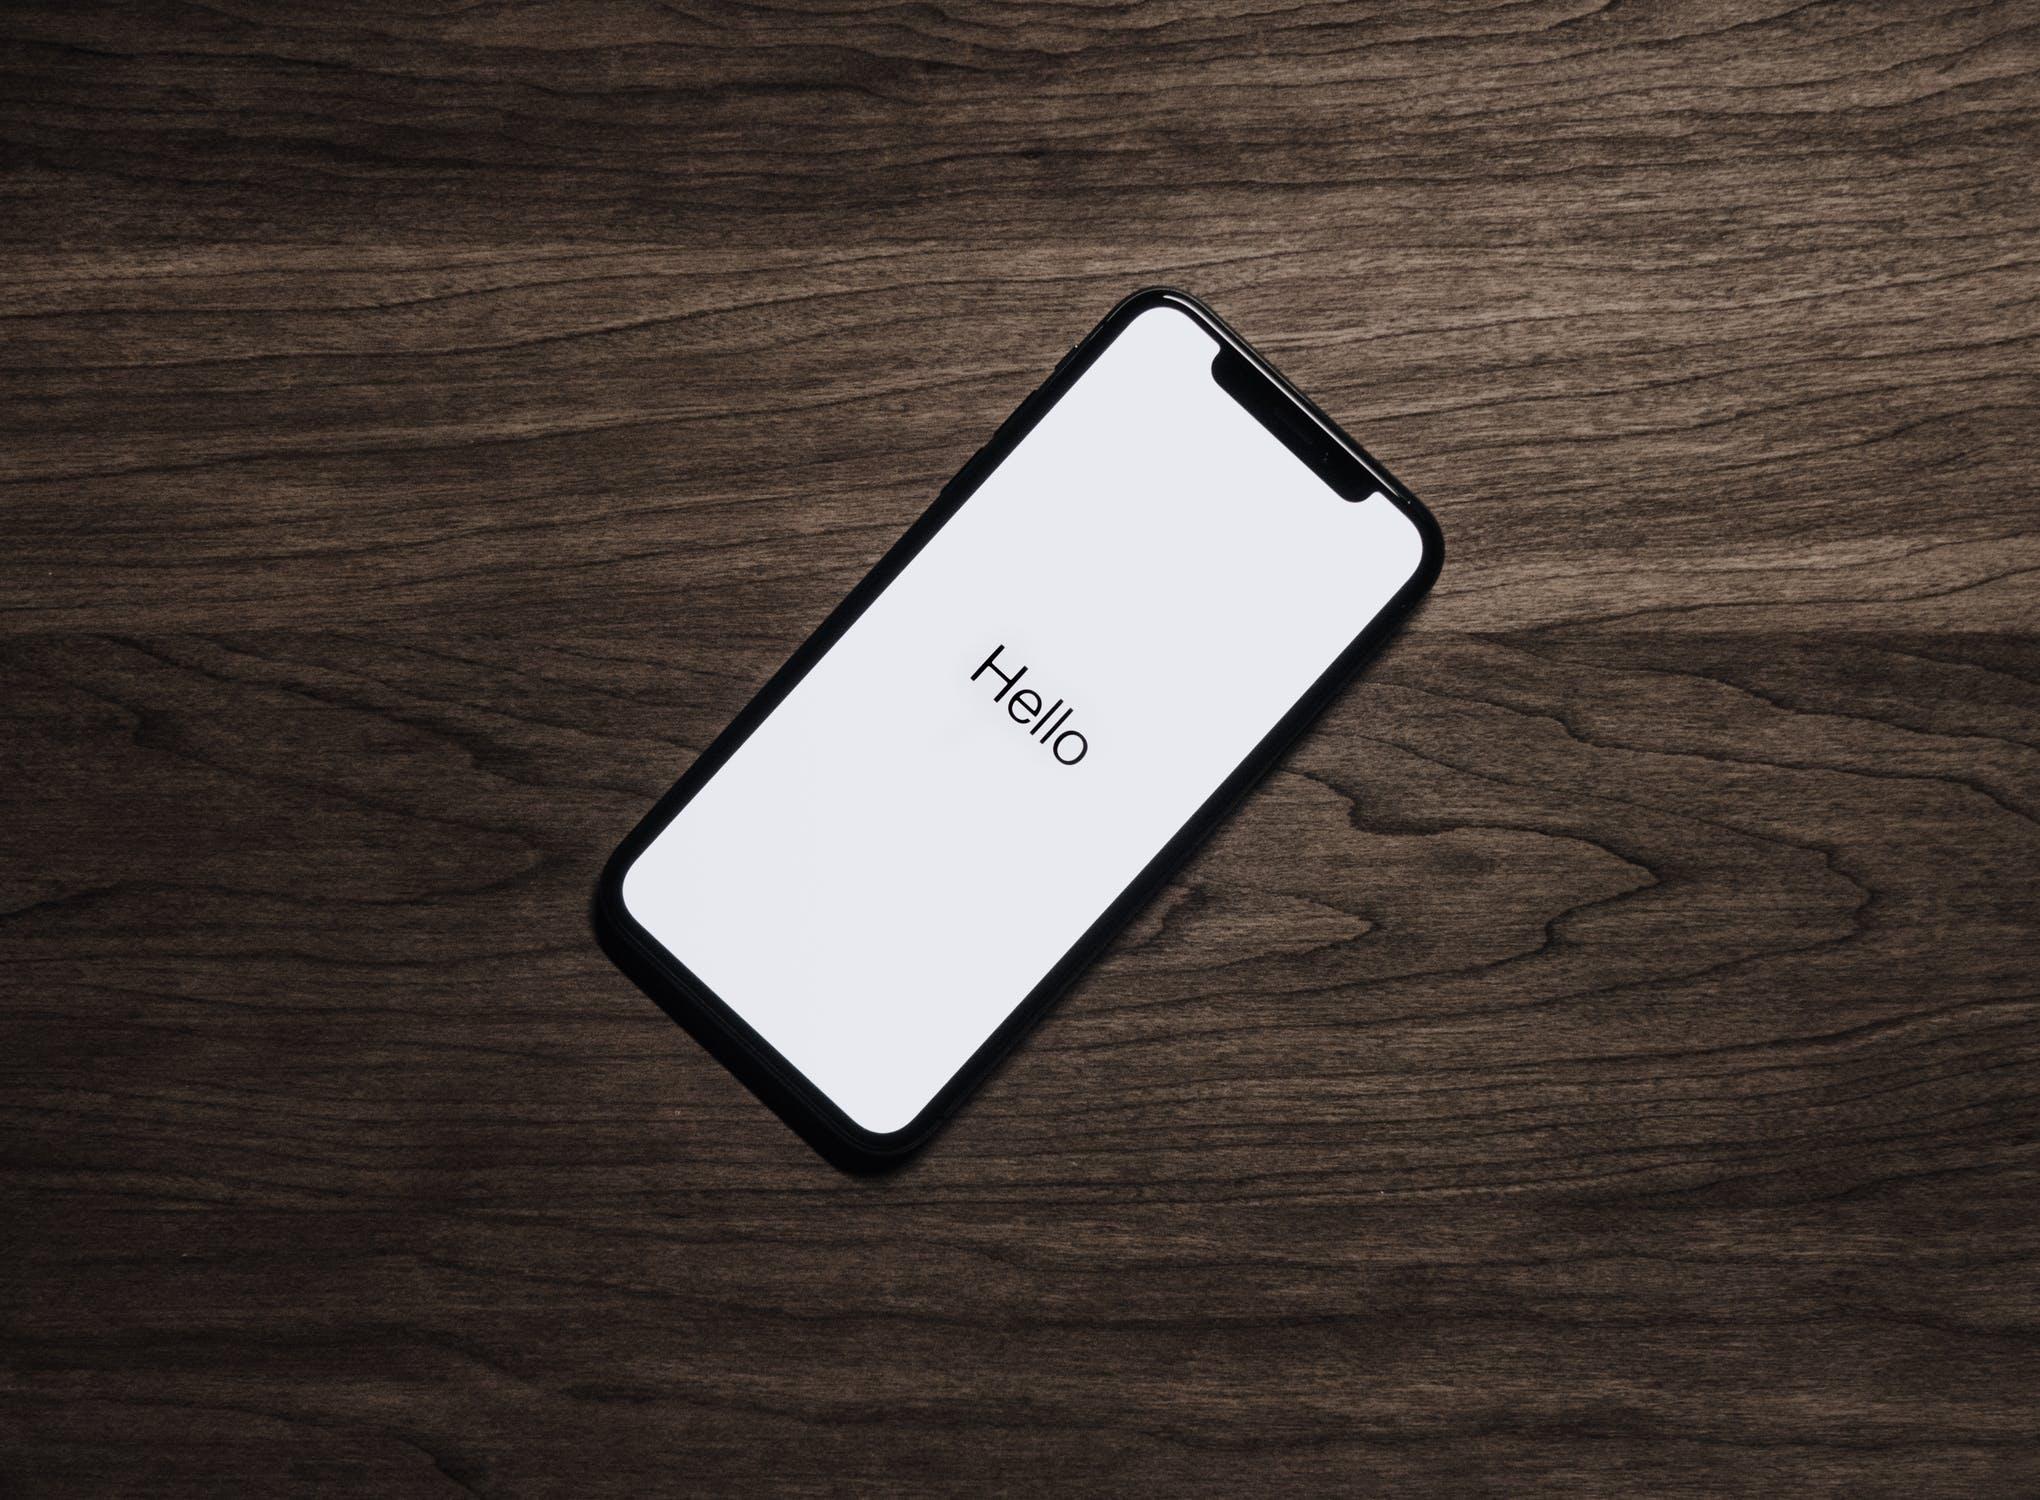 Create a customized phone vibration: